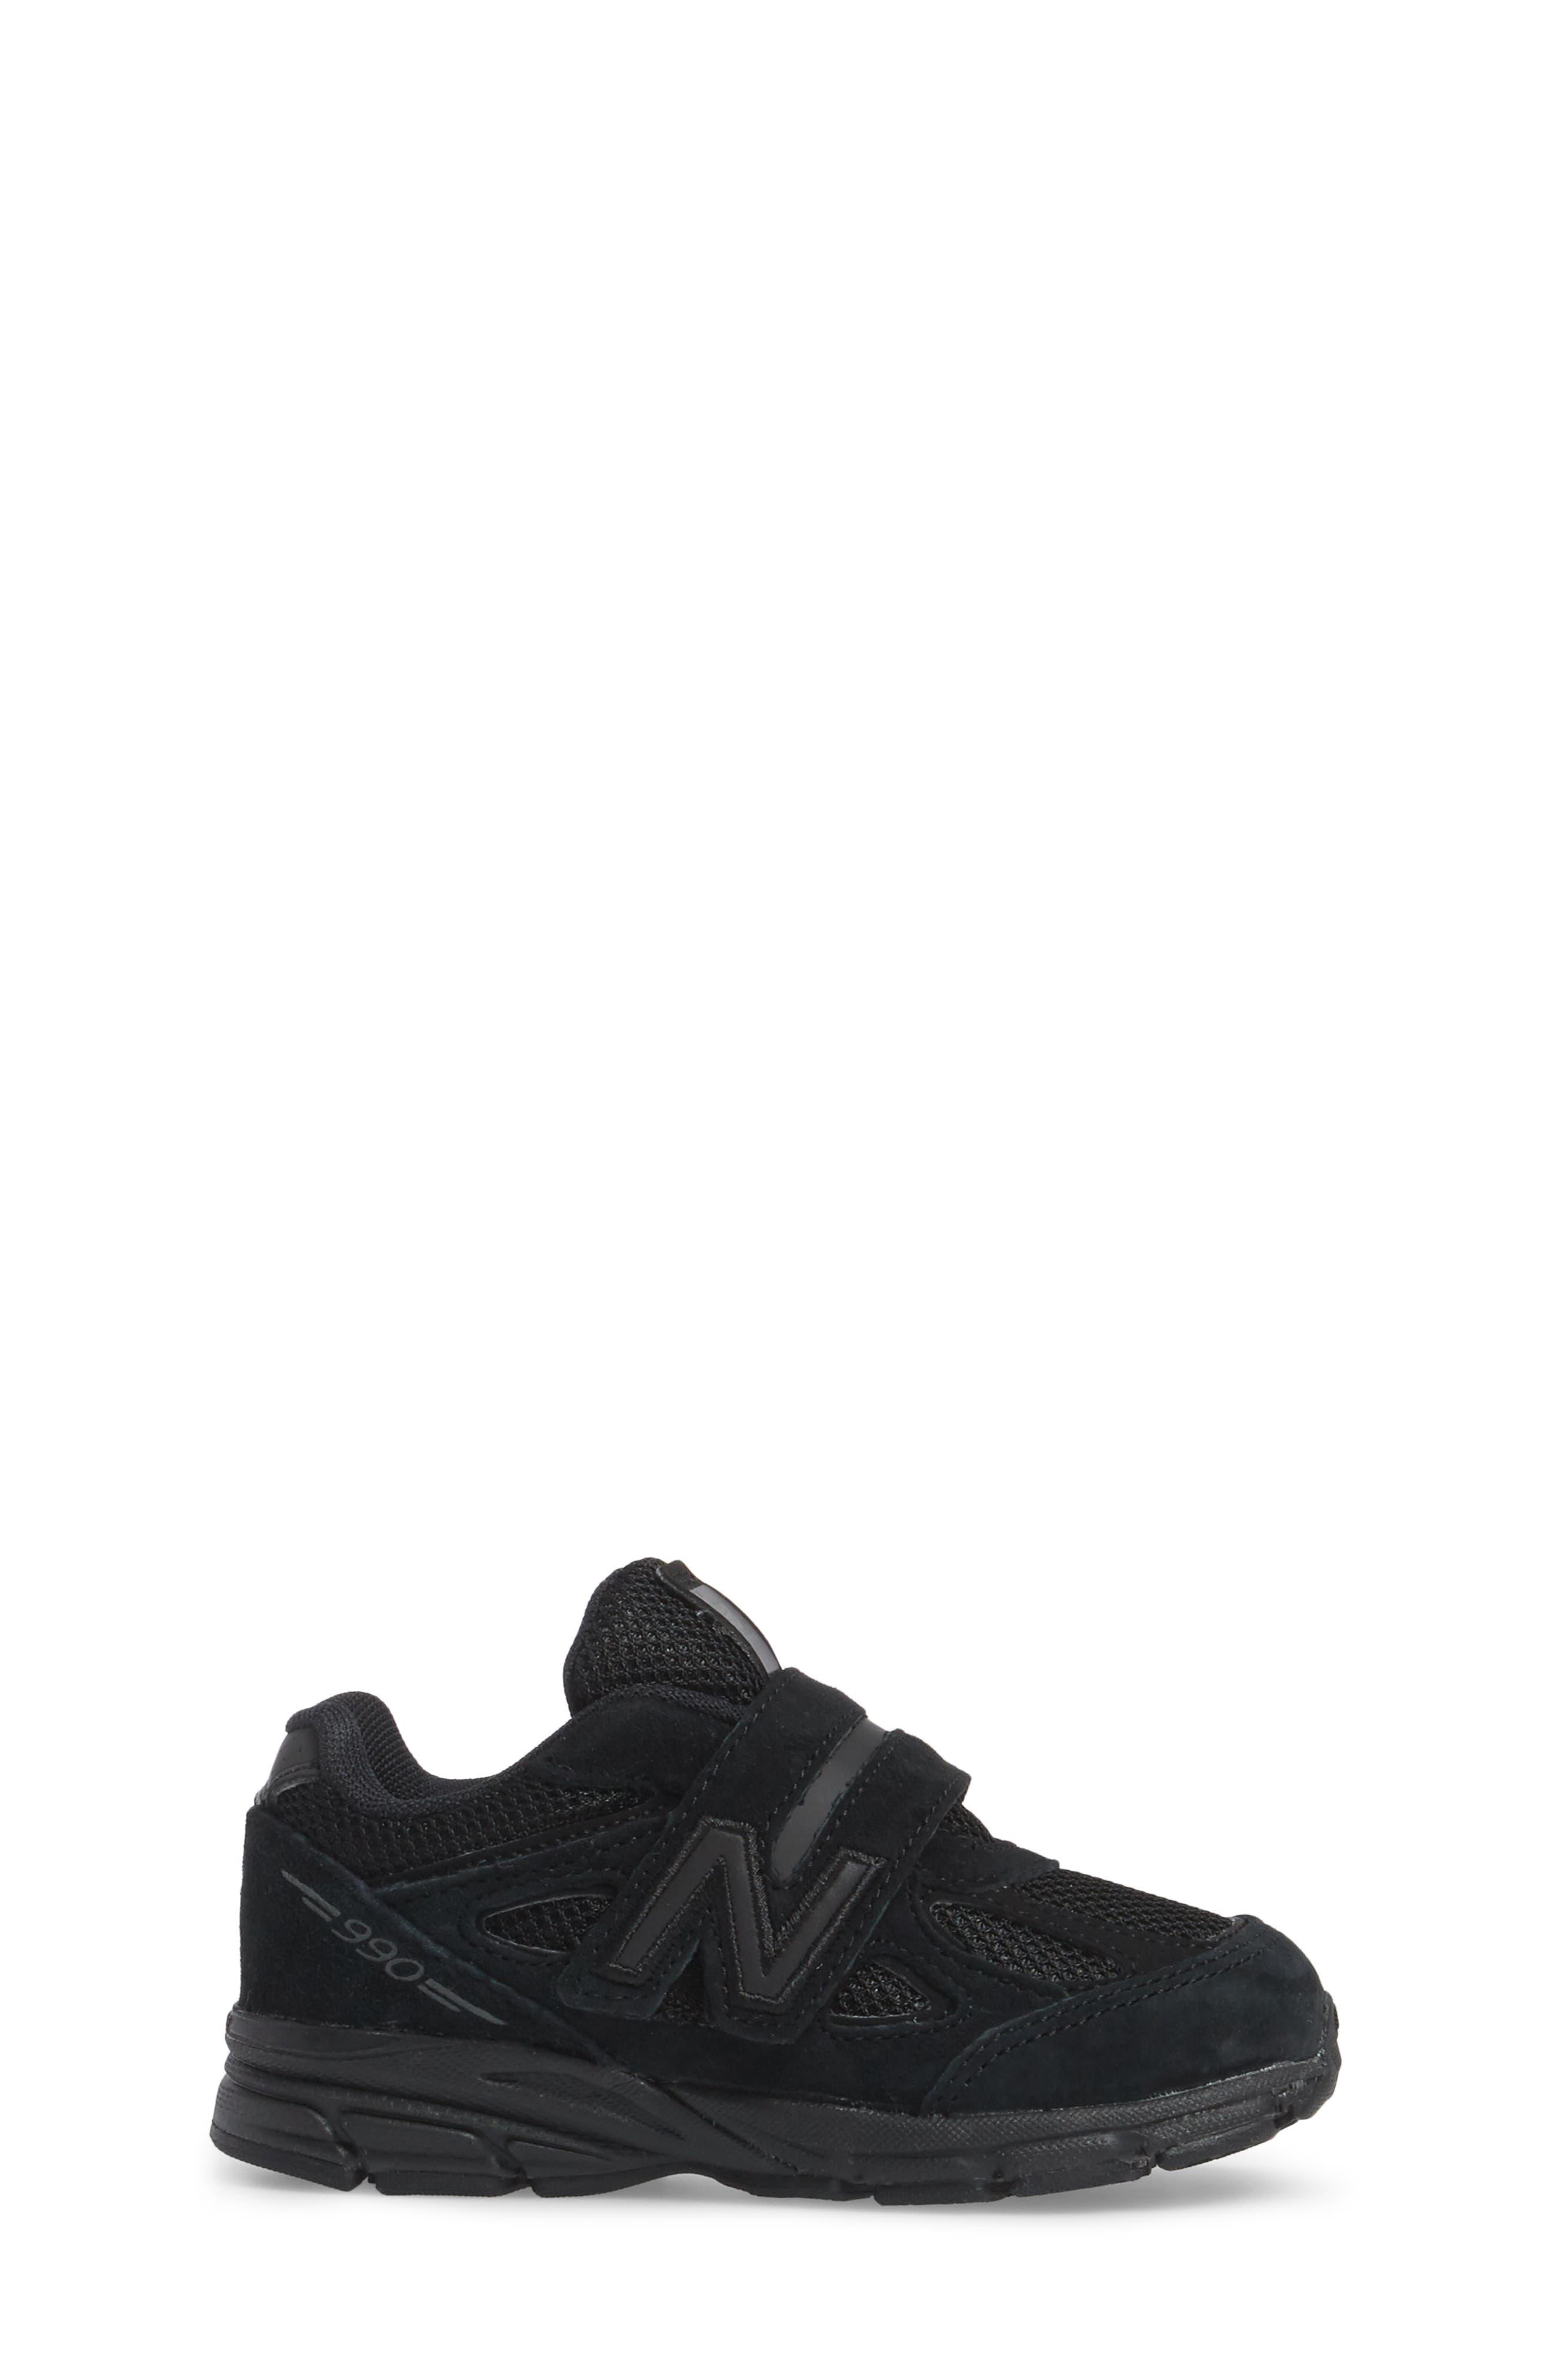 '990v4' Sneaker,                             Alternate thumbnail 3, color,                             Black/ Black